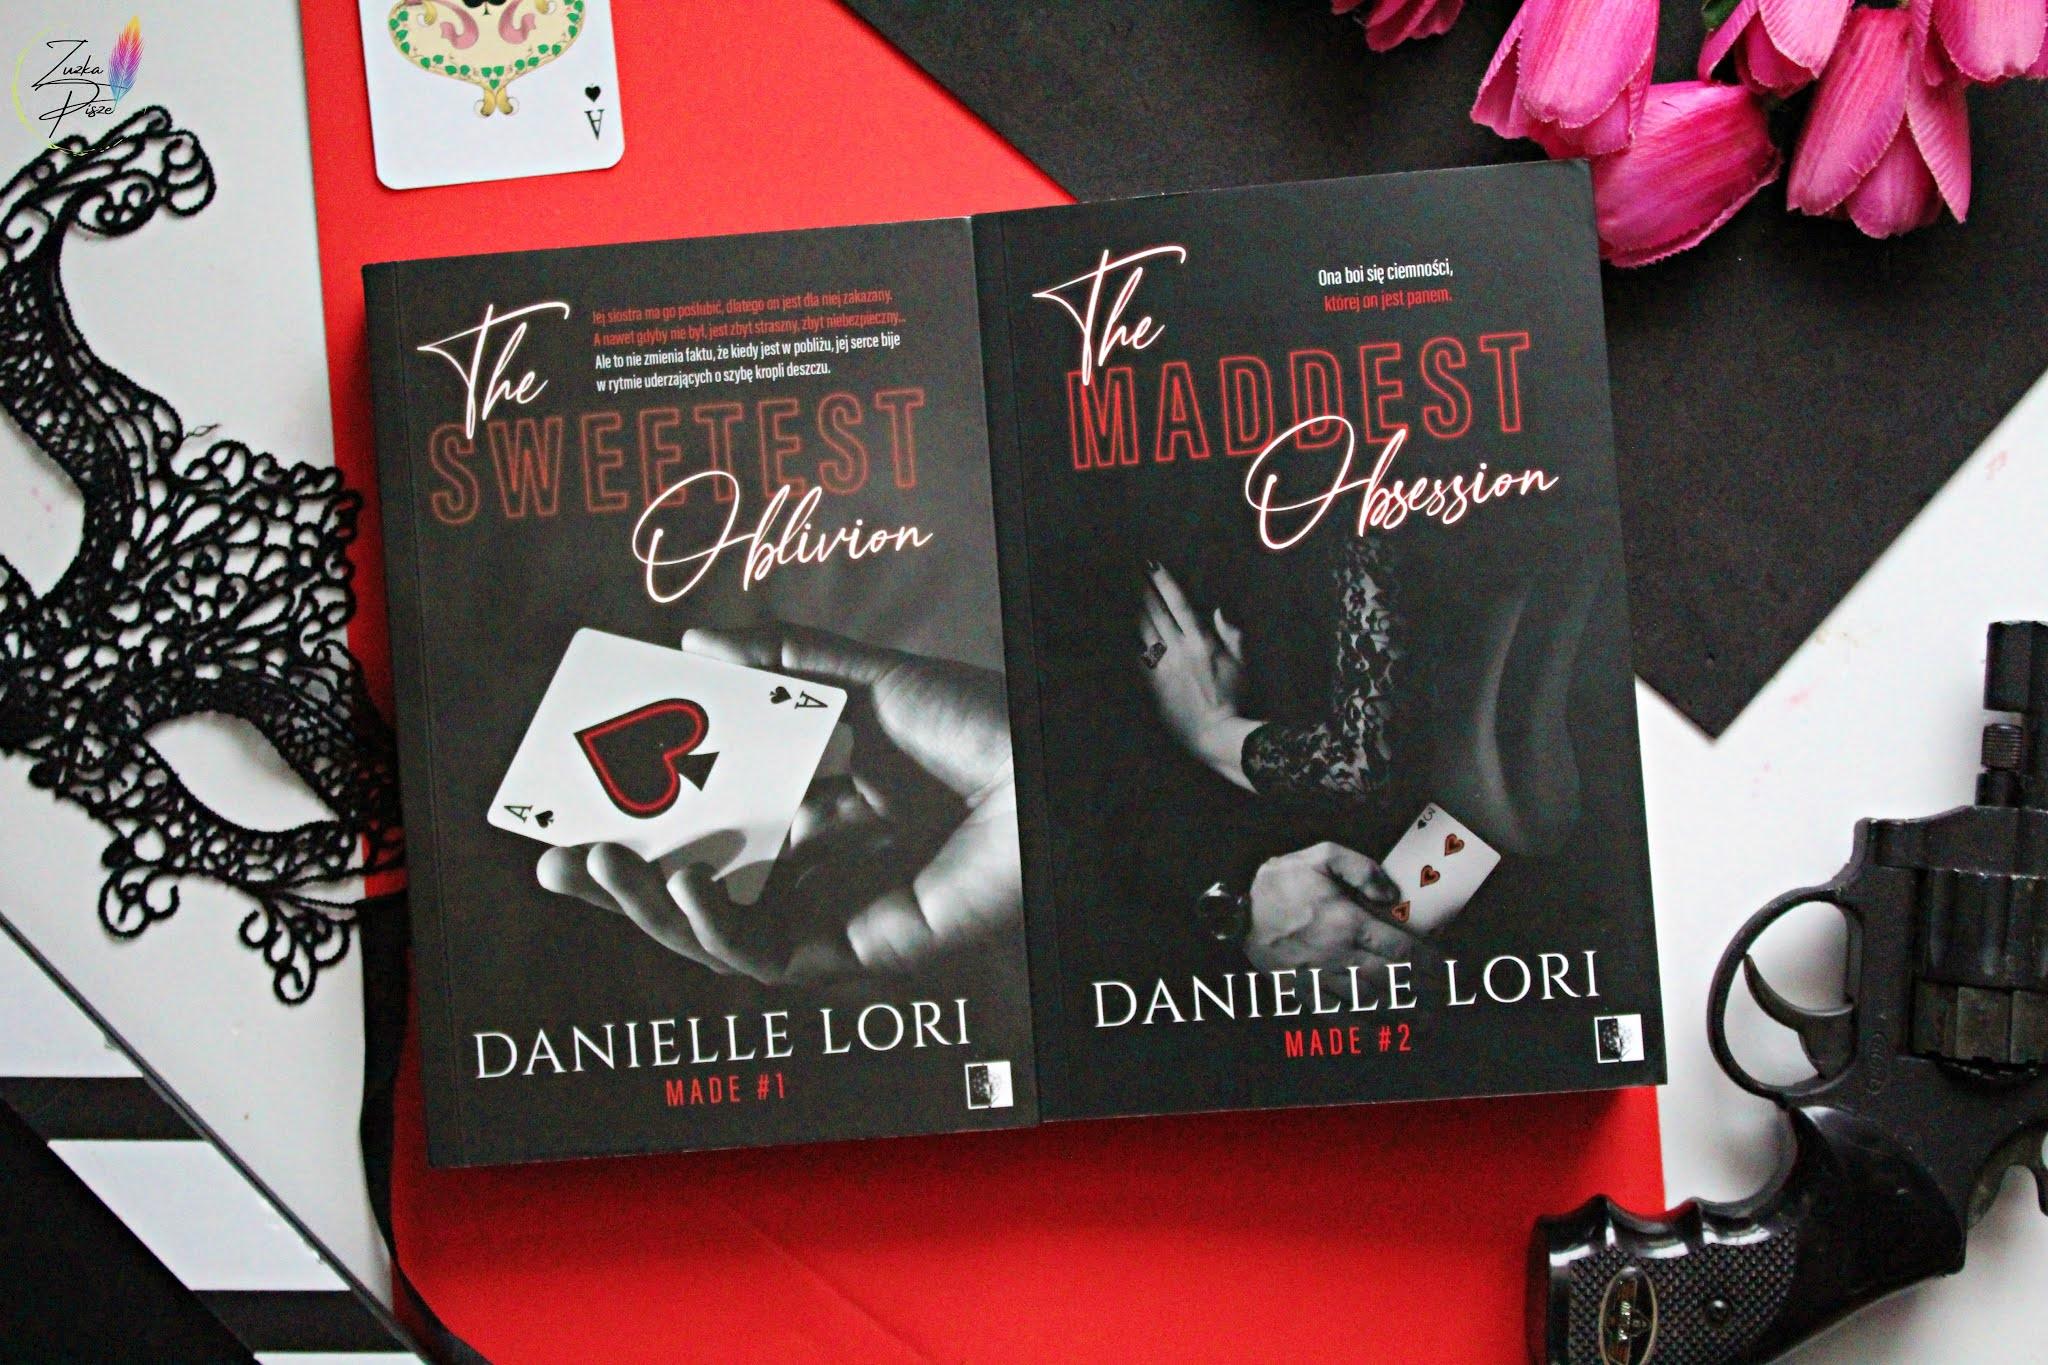 "Danielle Lori ""The Maddest Obsession"" - recenzja patronacka"